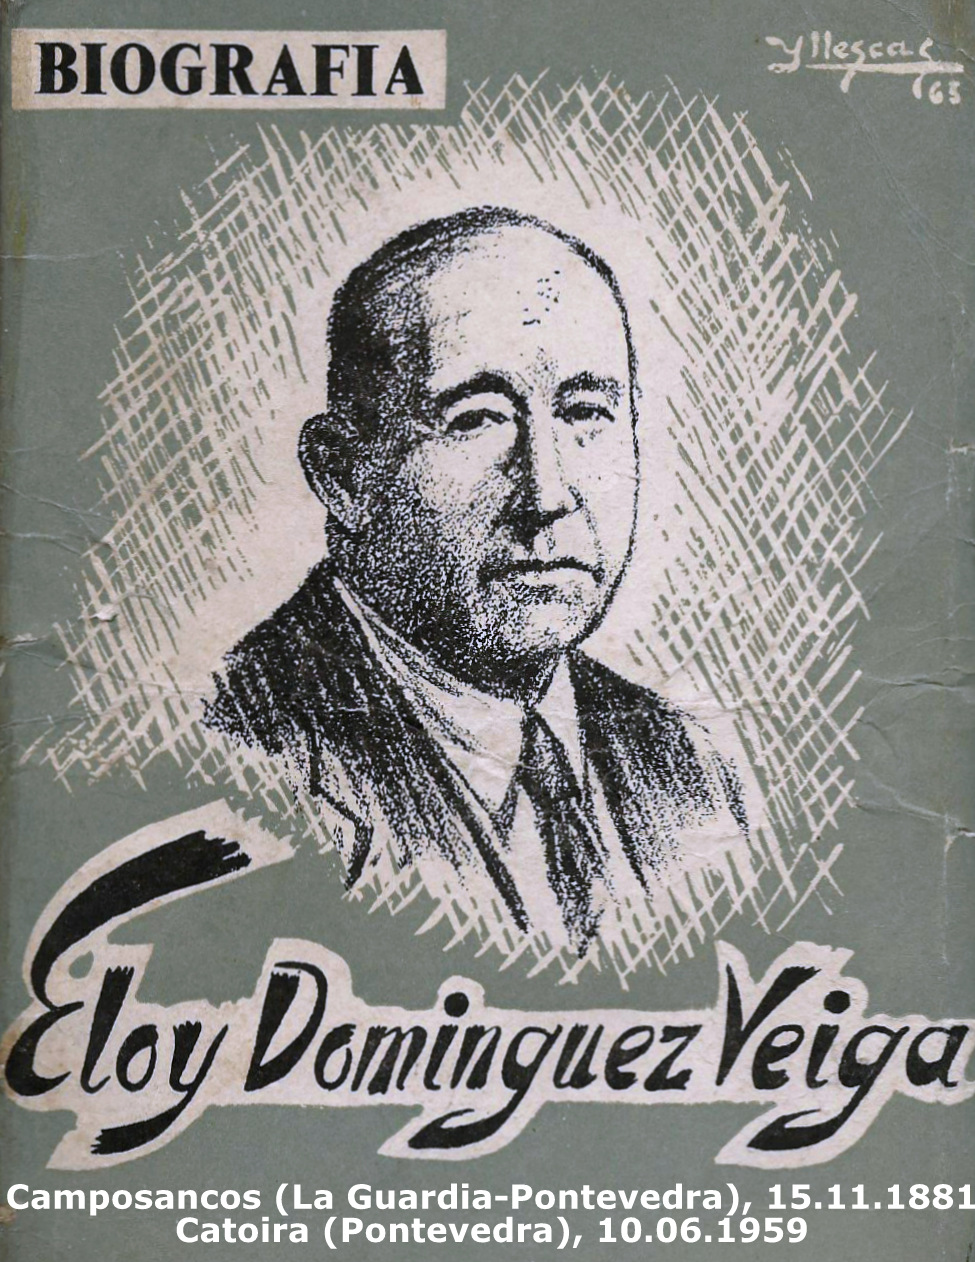 02.09.18 MANISERO ILUSTRE: ELOY DOMÍNGUEZ VEIGA - FCA DE CEDOLESA, EL BARRANQUET